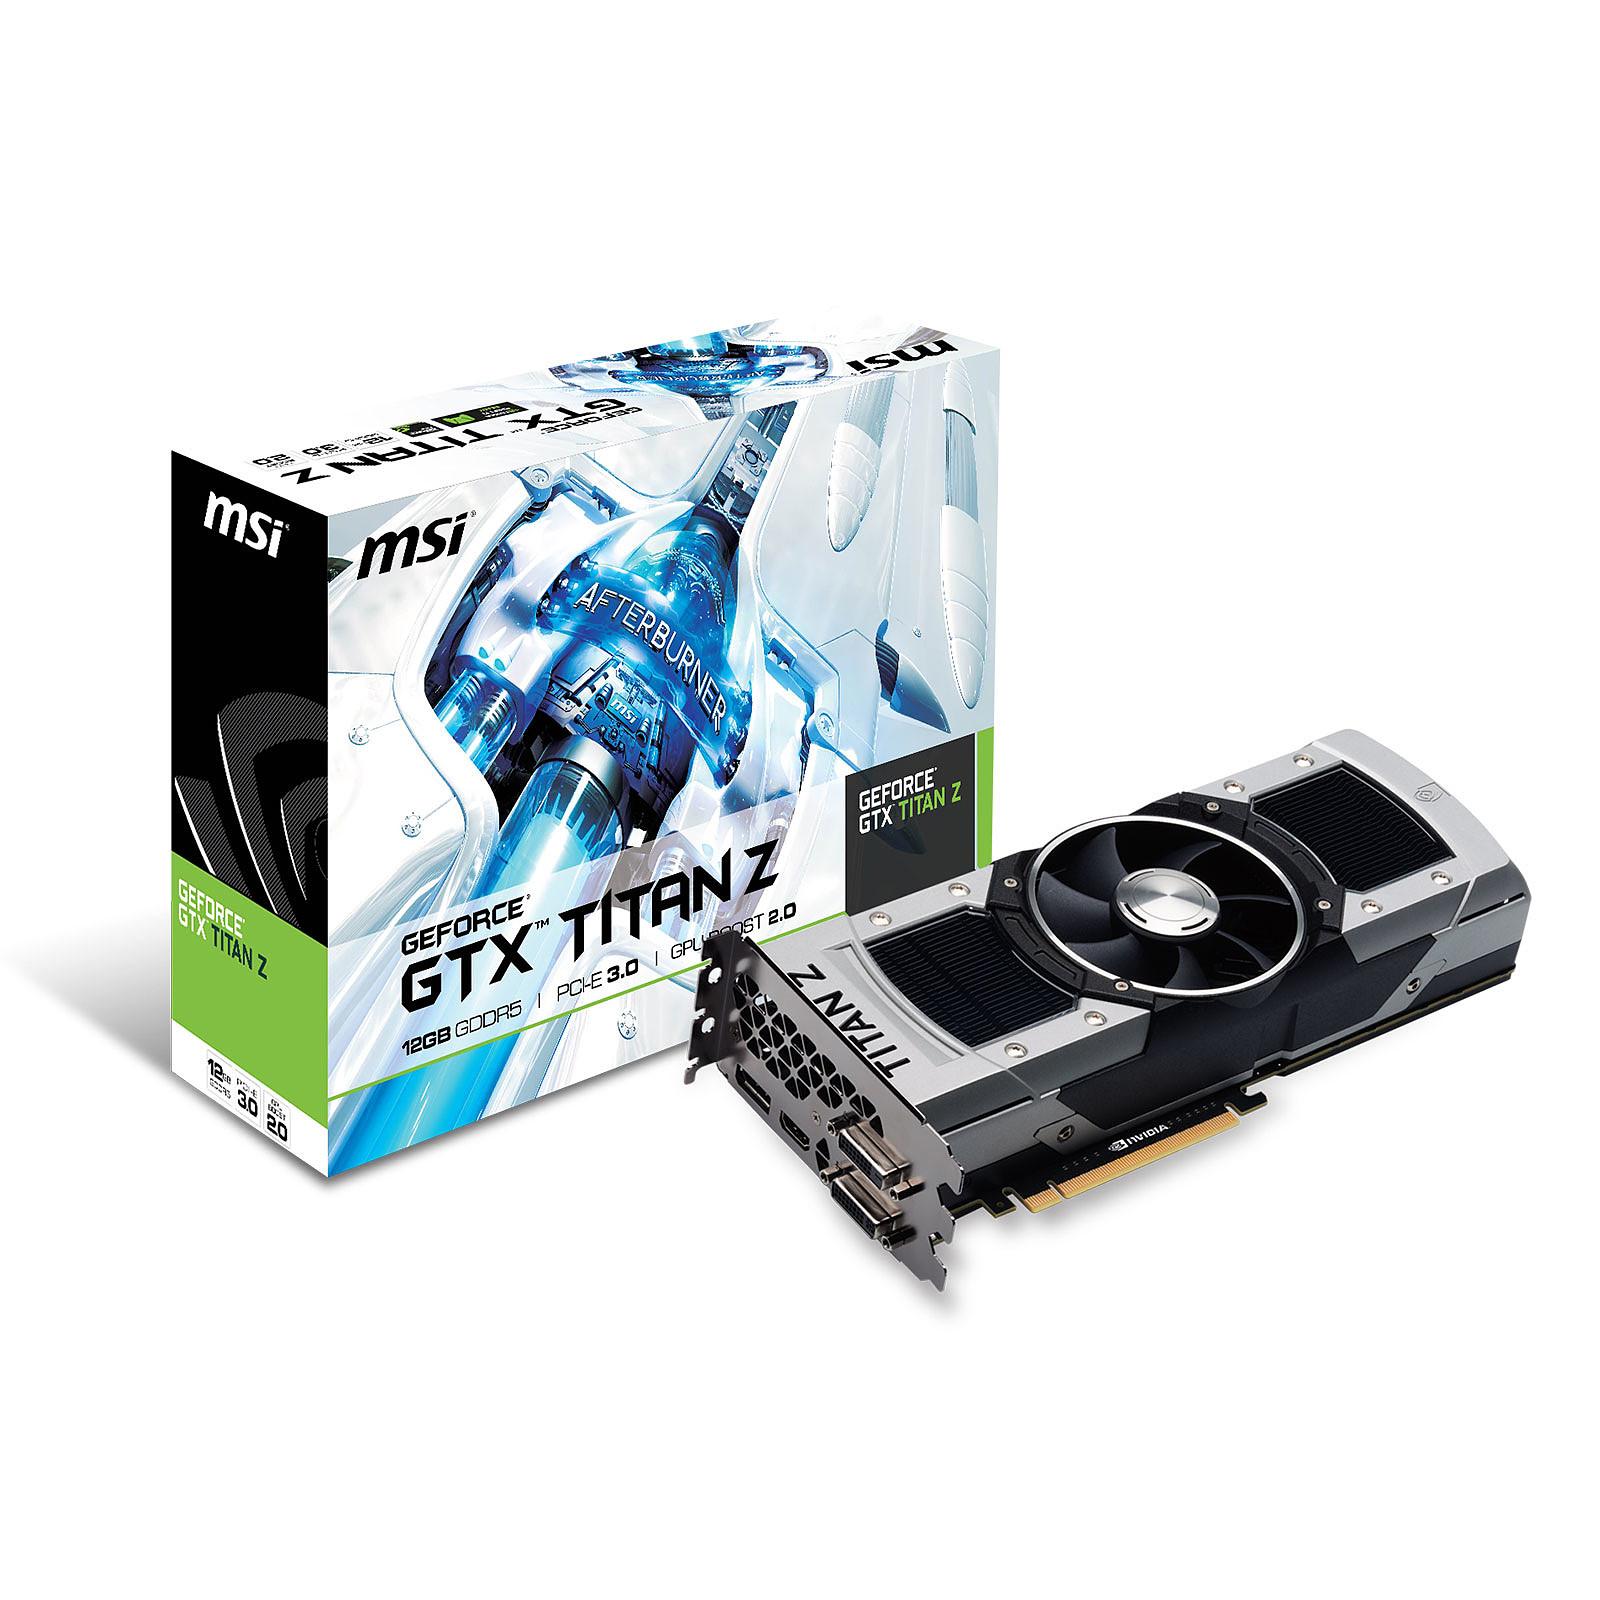 MSI NTITAN Z 12GD5 - GeForce GTX TITAN Z 12 Go